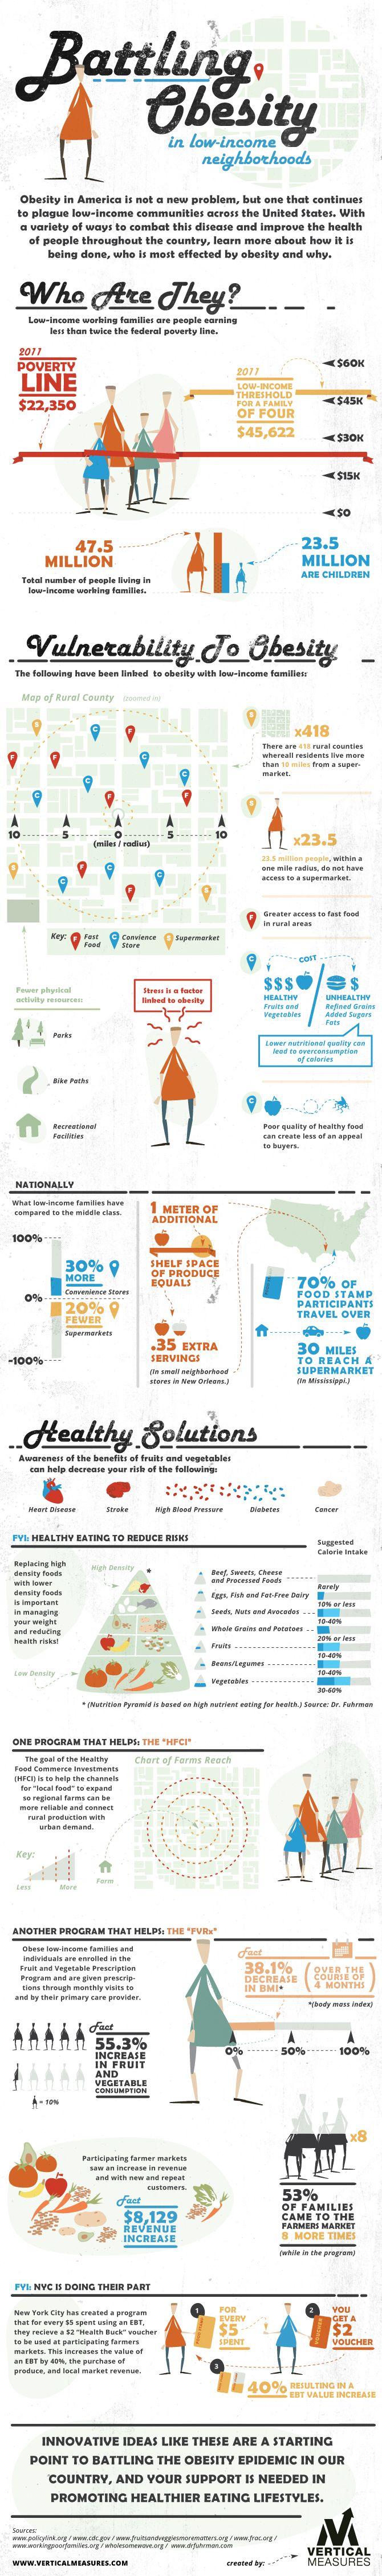 understanding-and-resolving-obesity-in-america